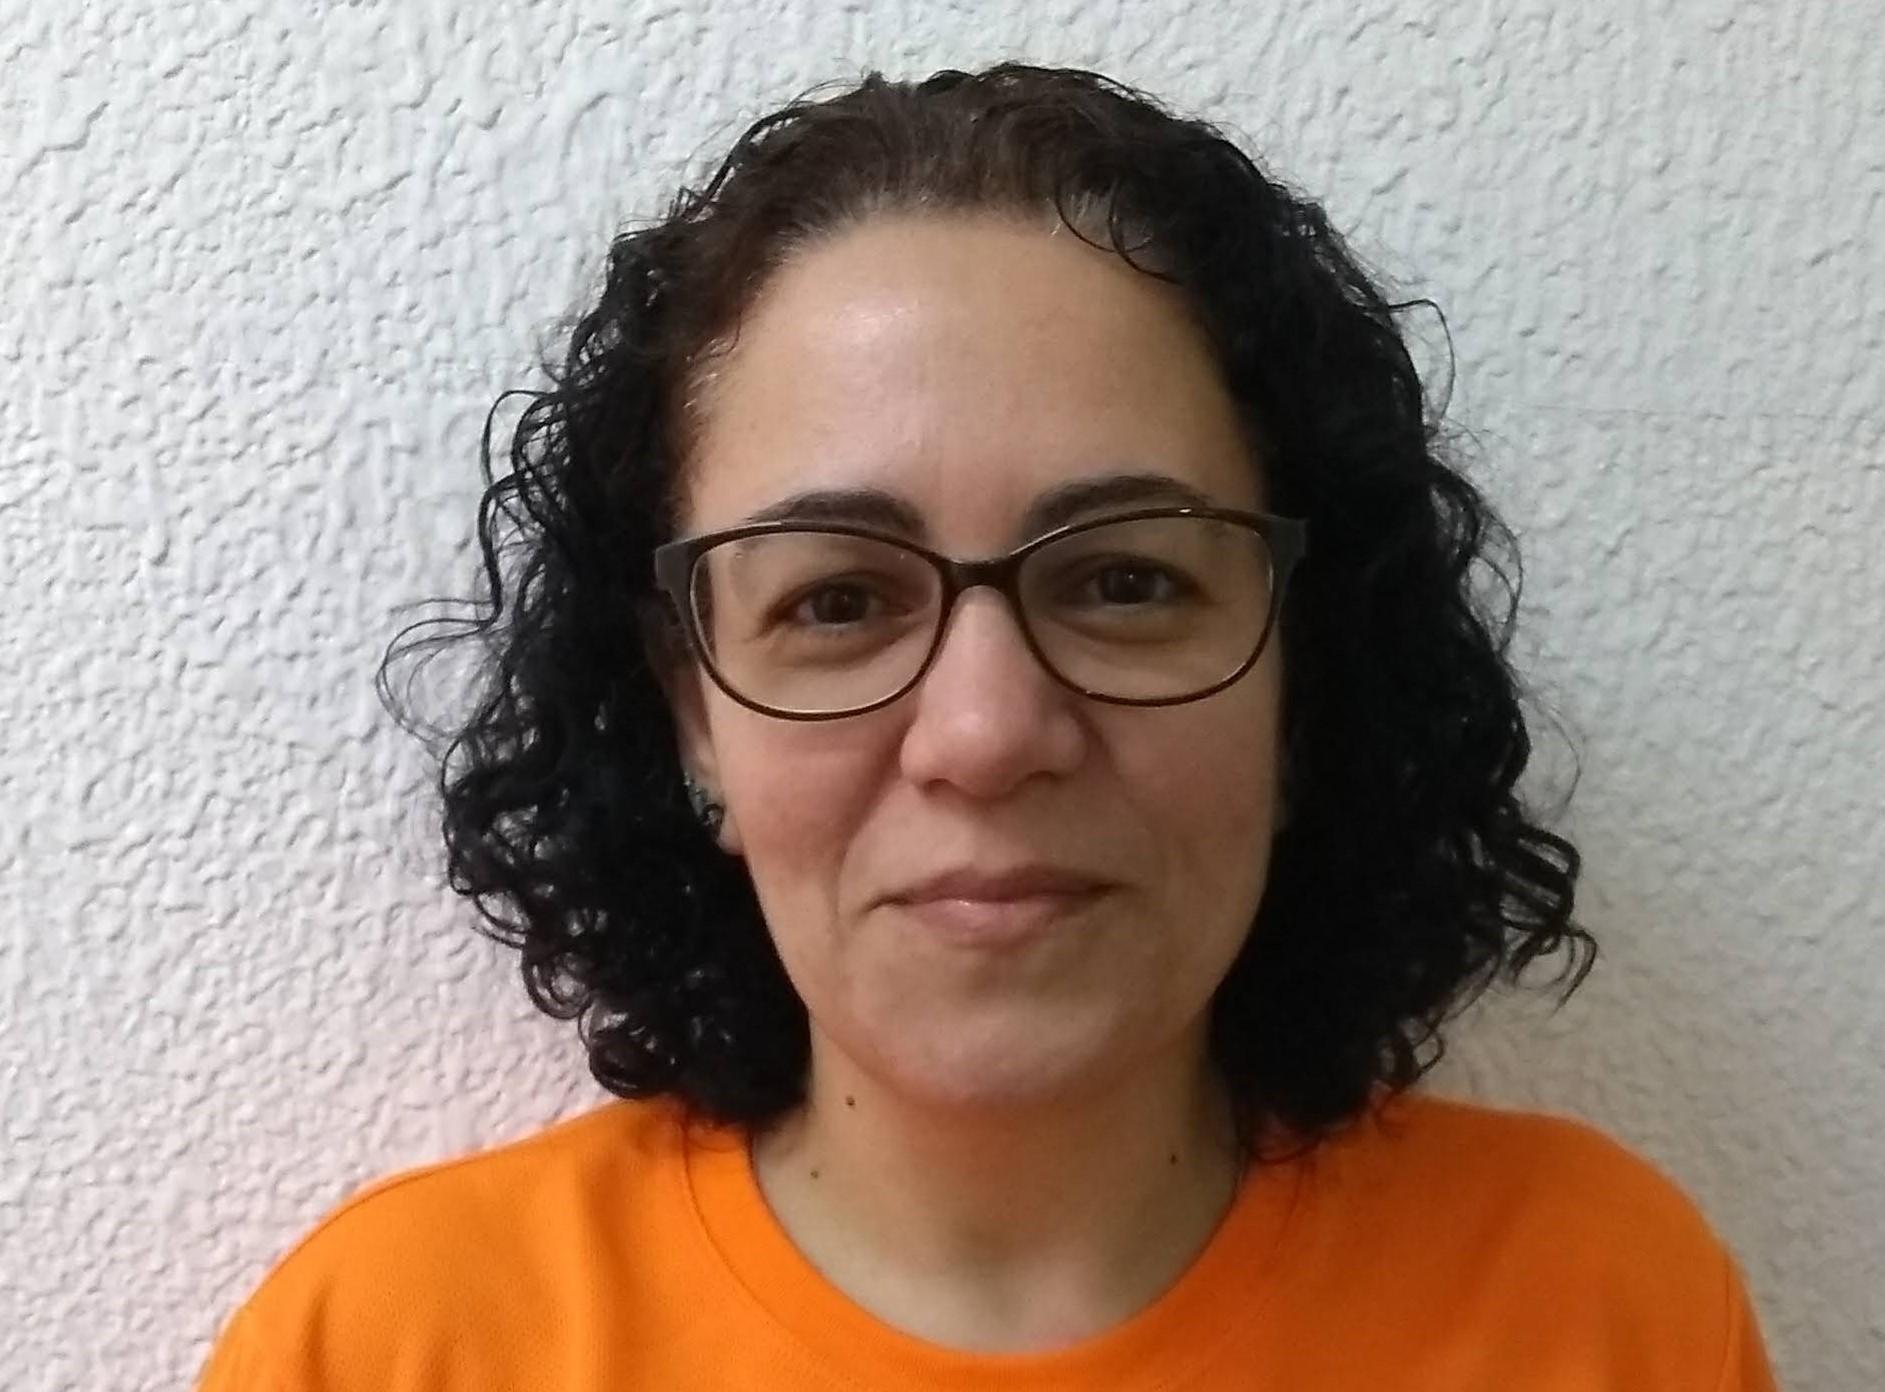 foto – Cosma Angélica Cavalcanti